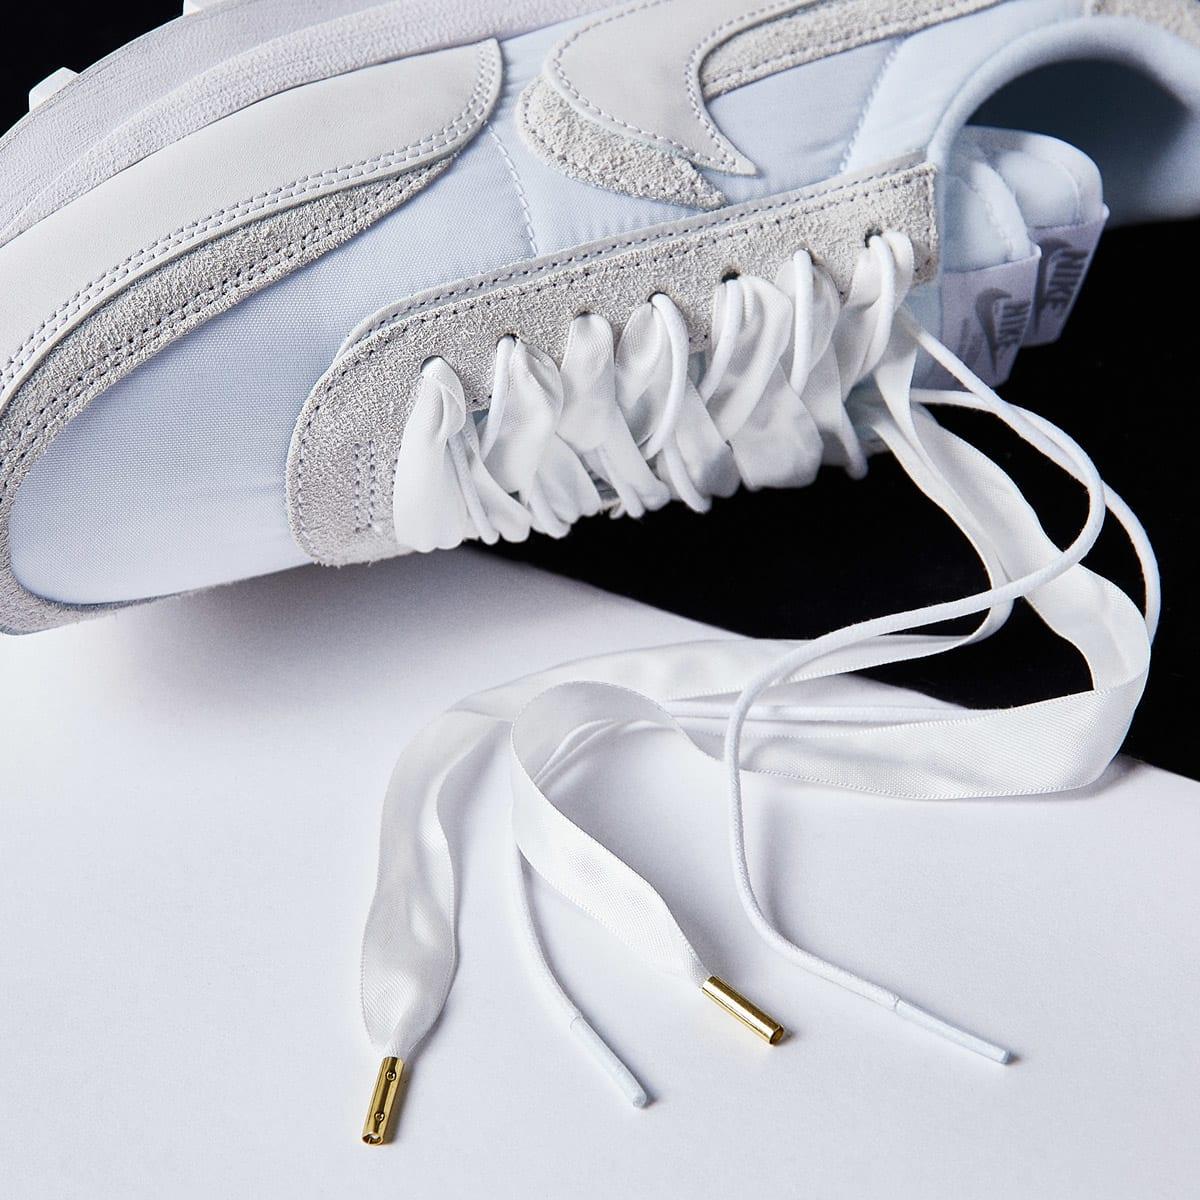 Nike x Sacai LDWaffle - BV0073-101